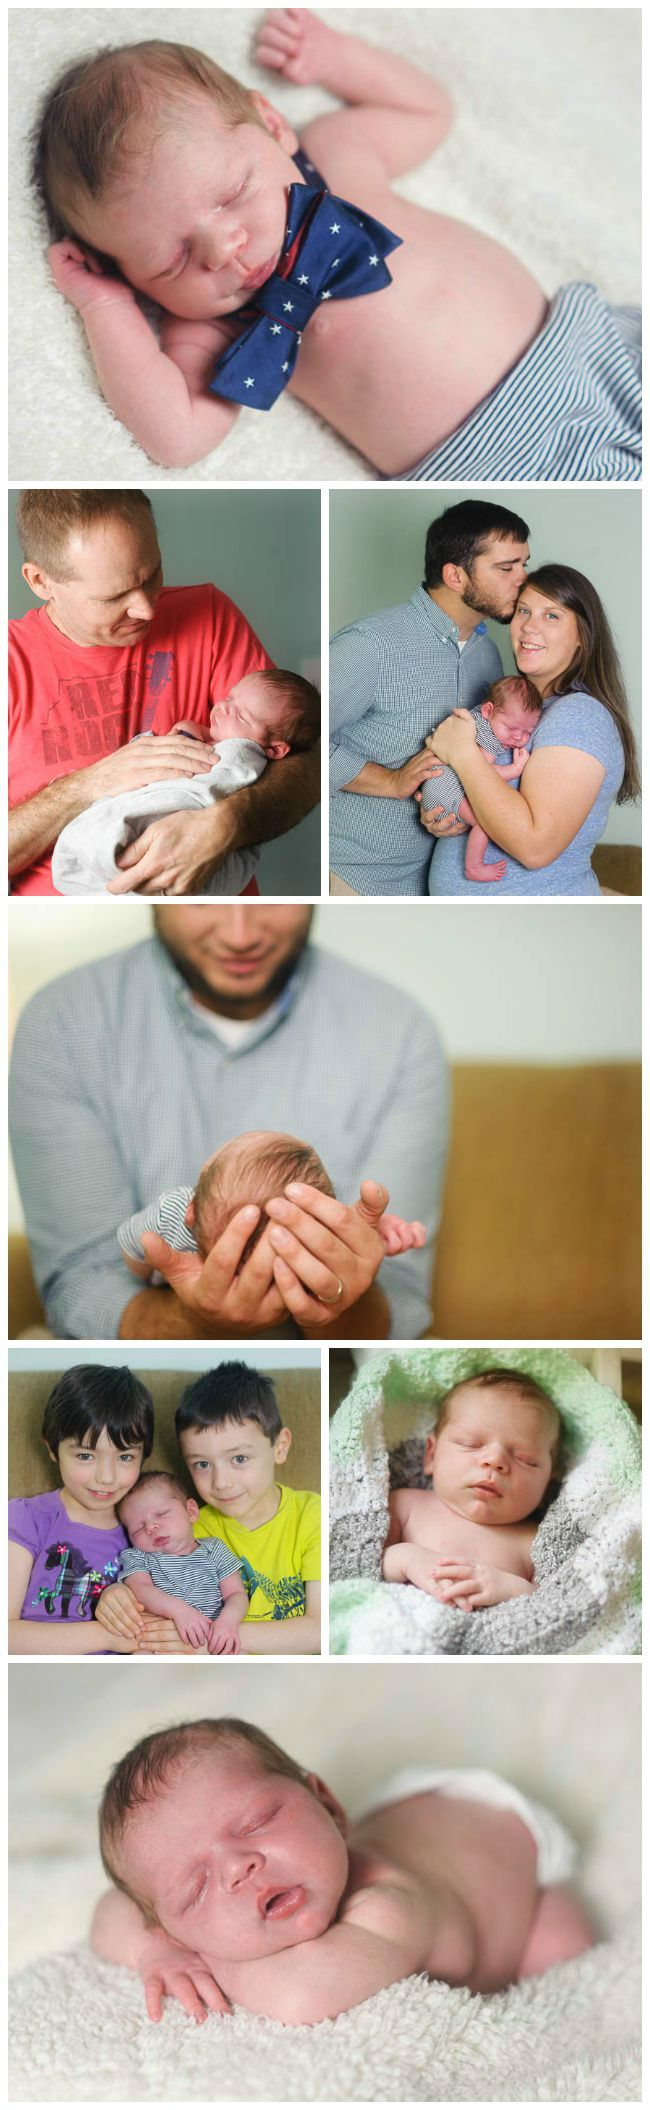 Carter newborn photo collage